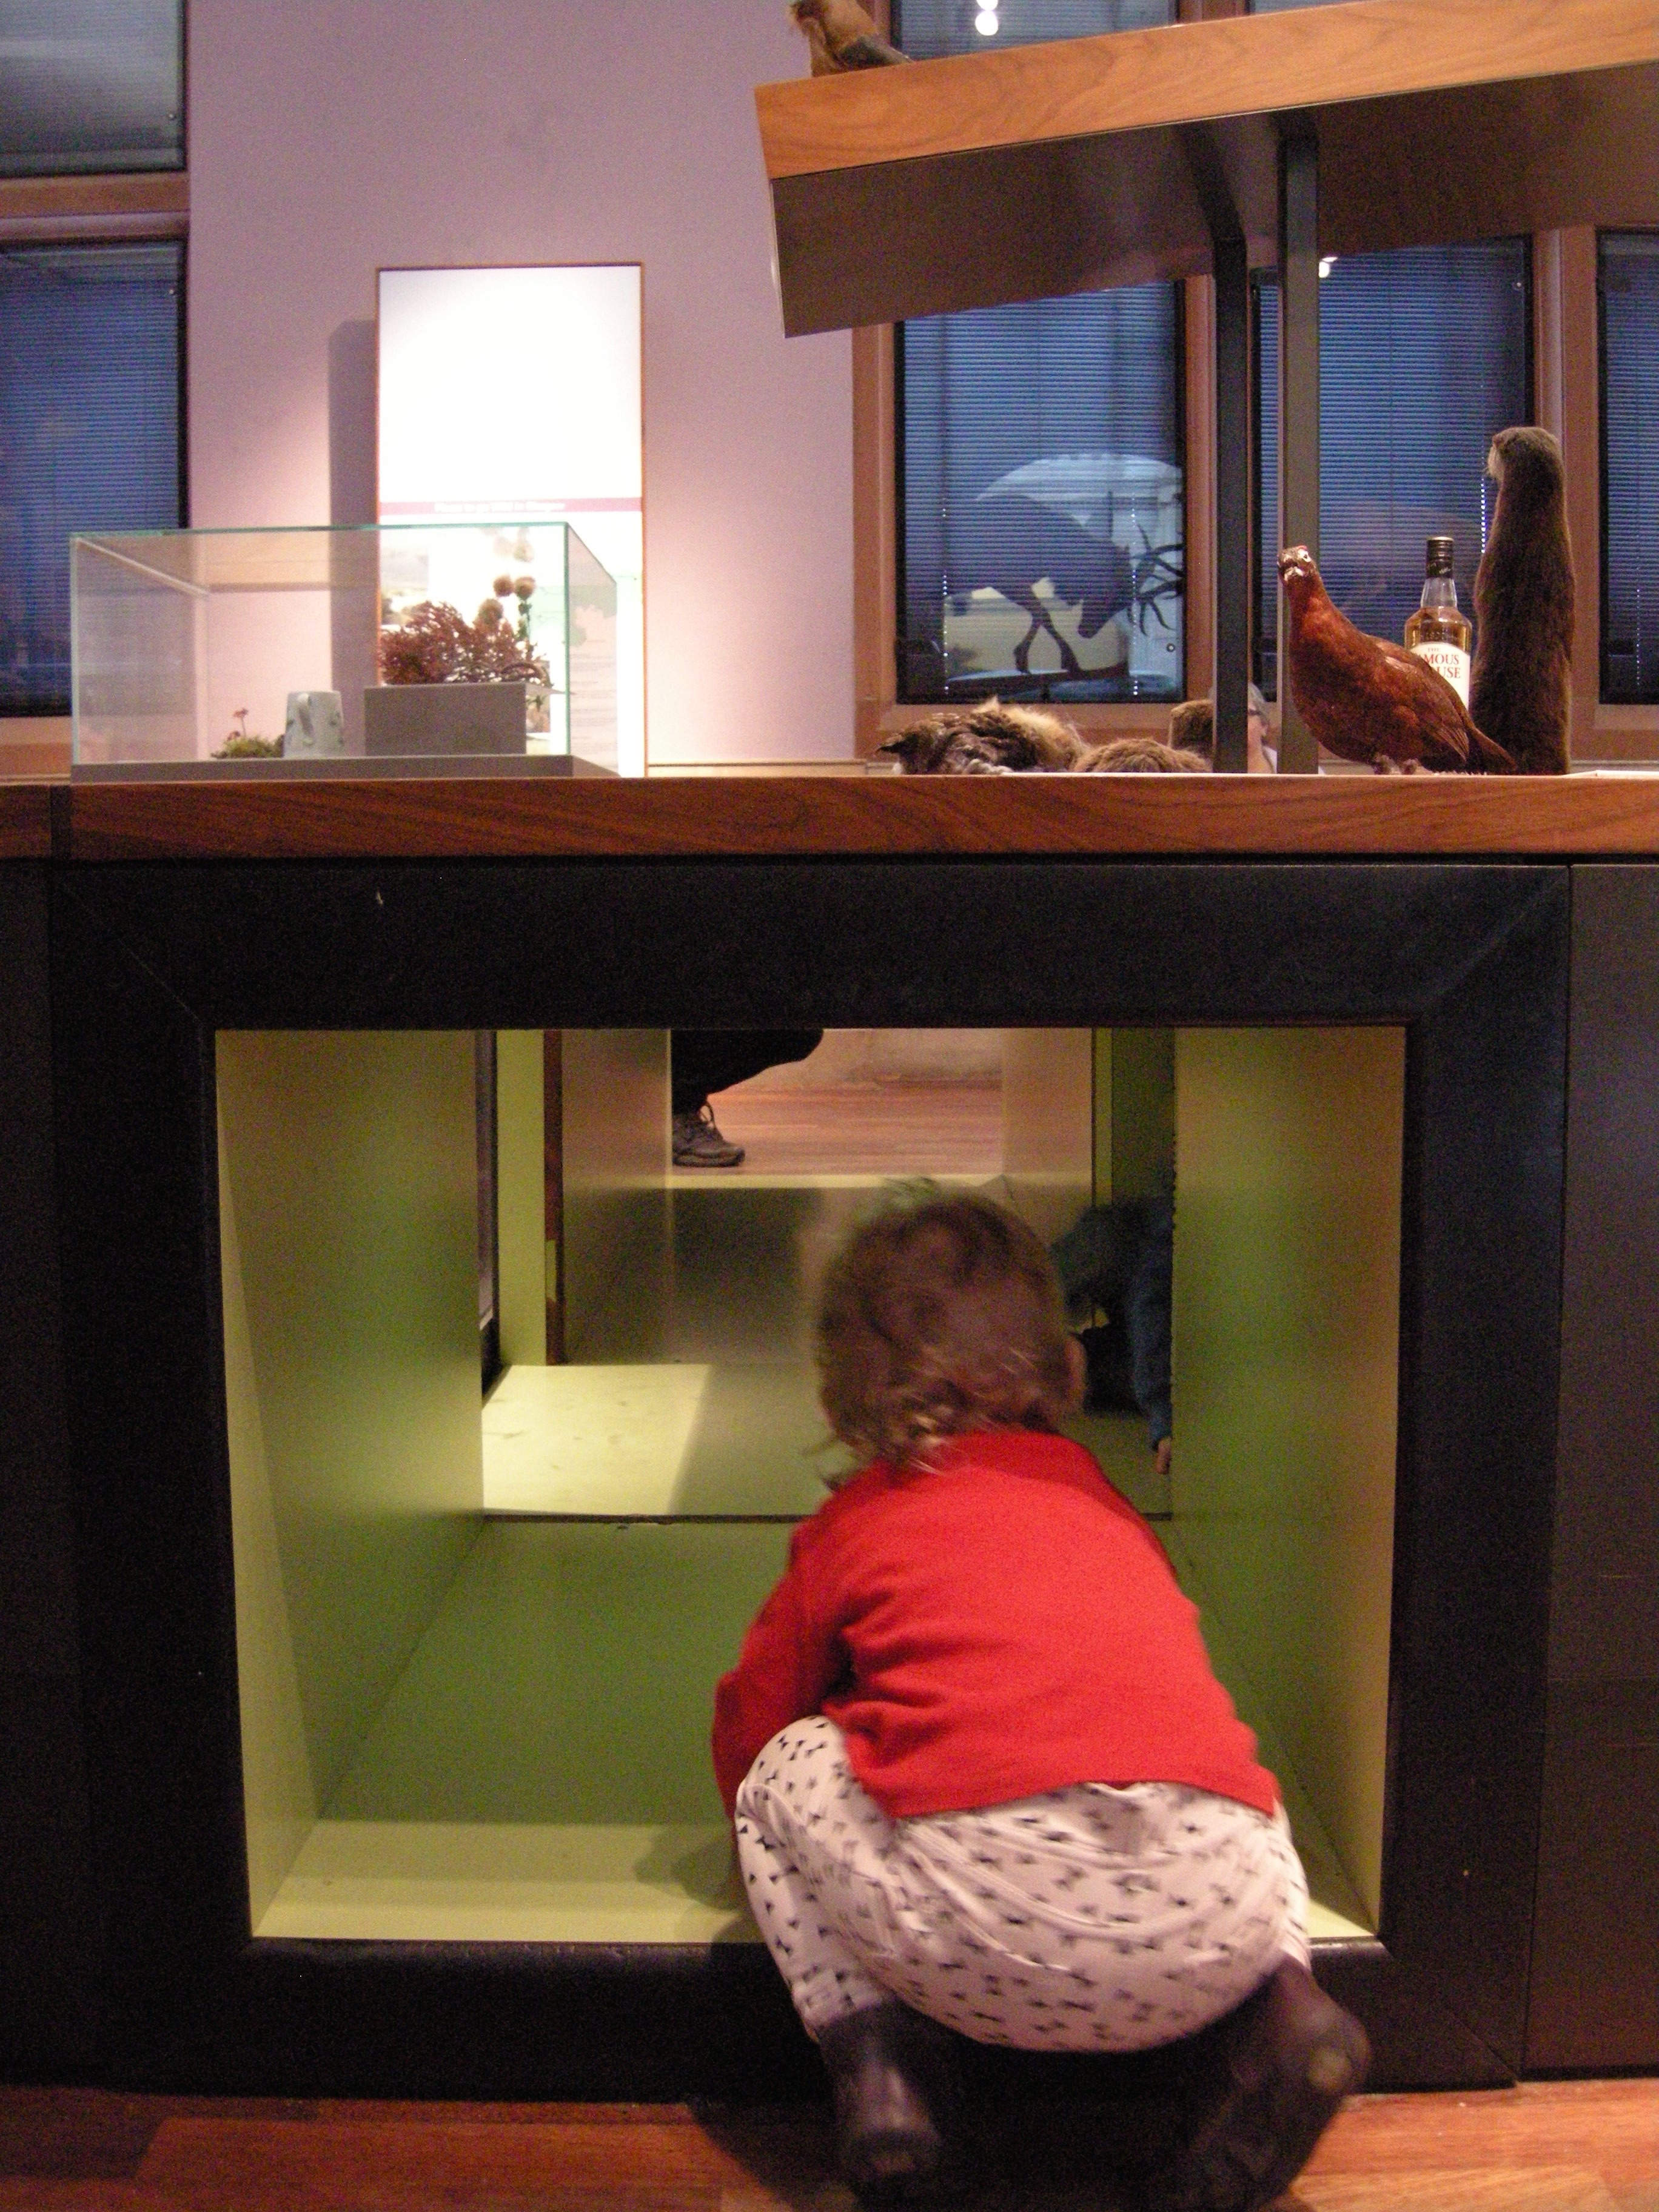 Exploring the exhibits